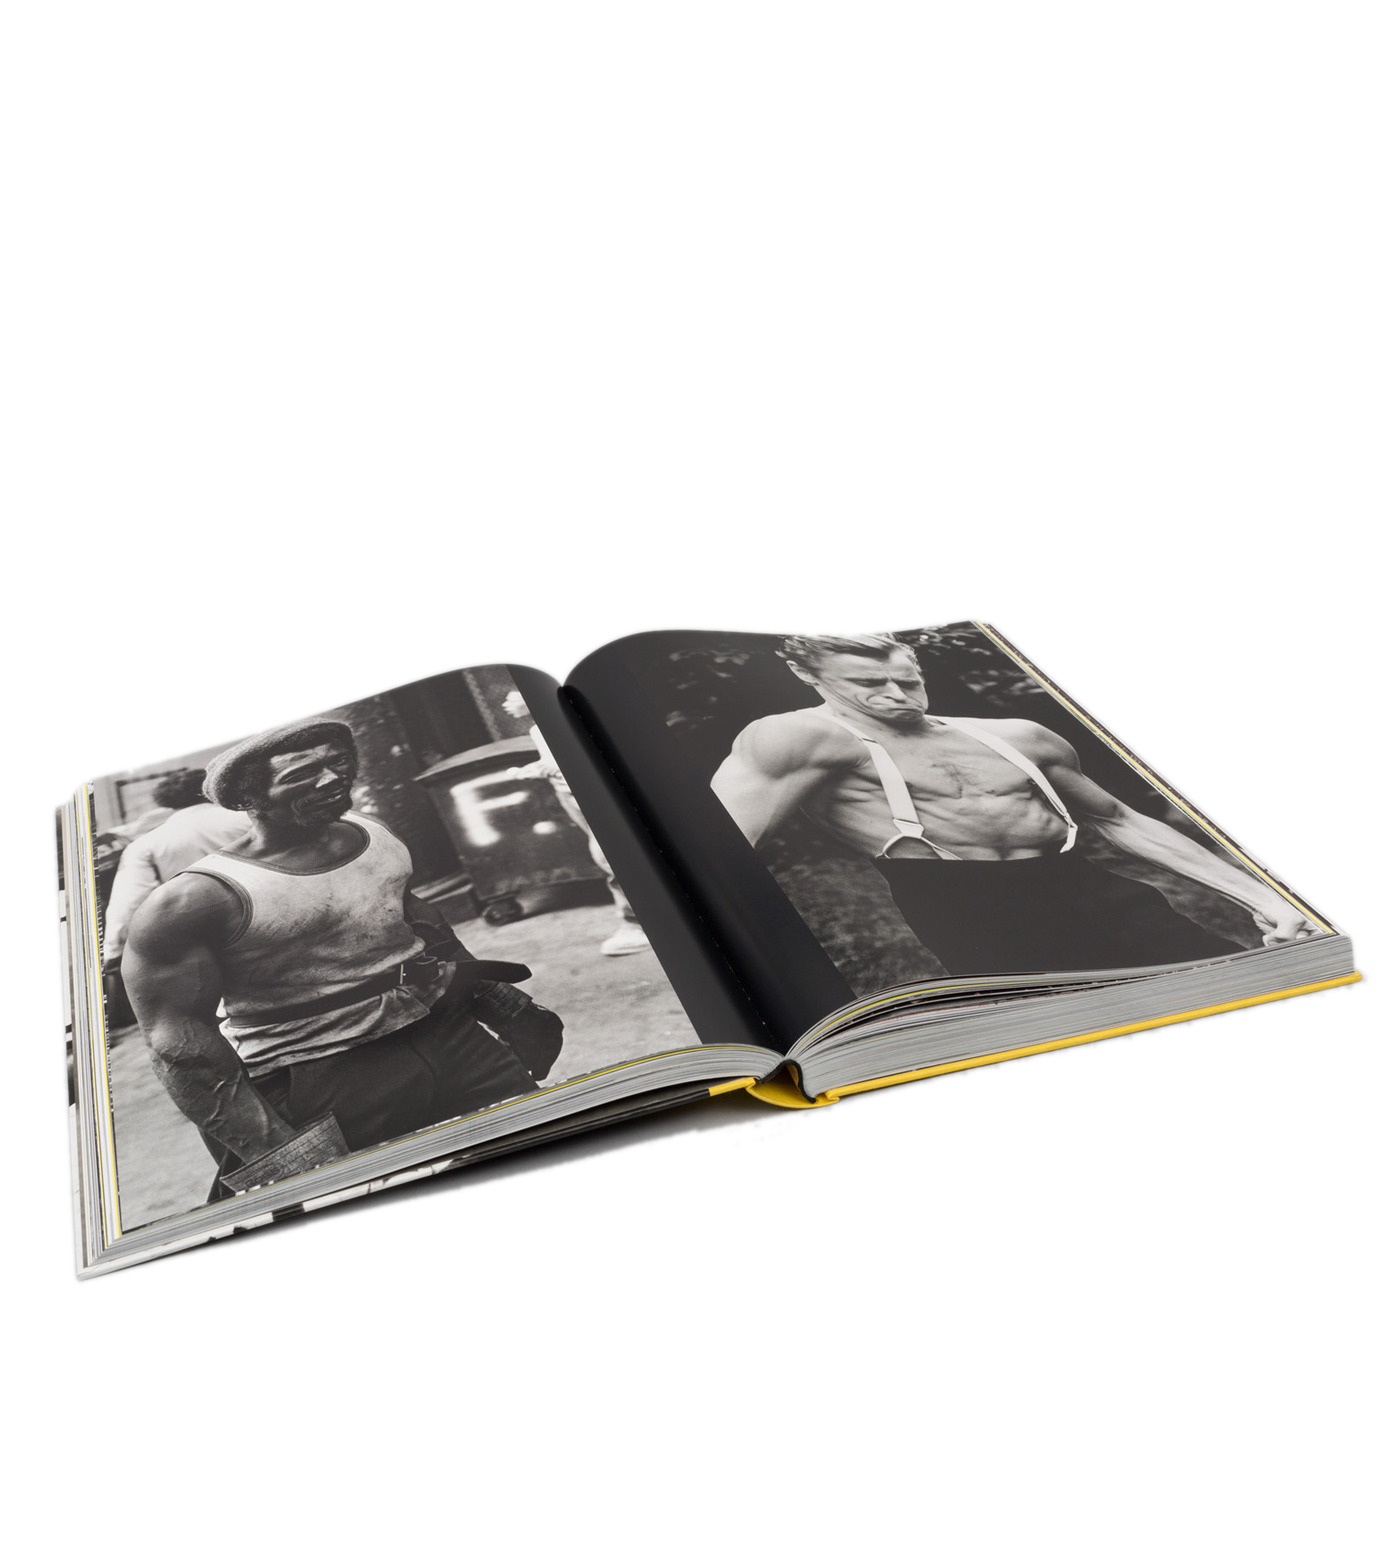 ArtBook(アートブック)のArthur Elgort:The Big Picture.-GRAY(インテリア/OTHER-GOODS/interior/OTHER-GOODS)-86930-543-1-11 拡大詳細画像4